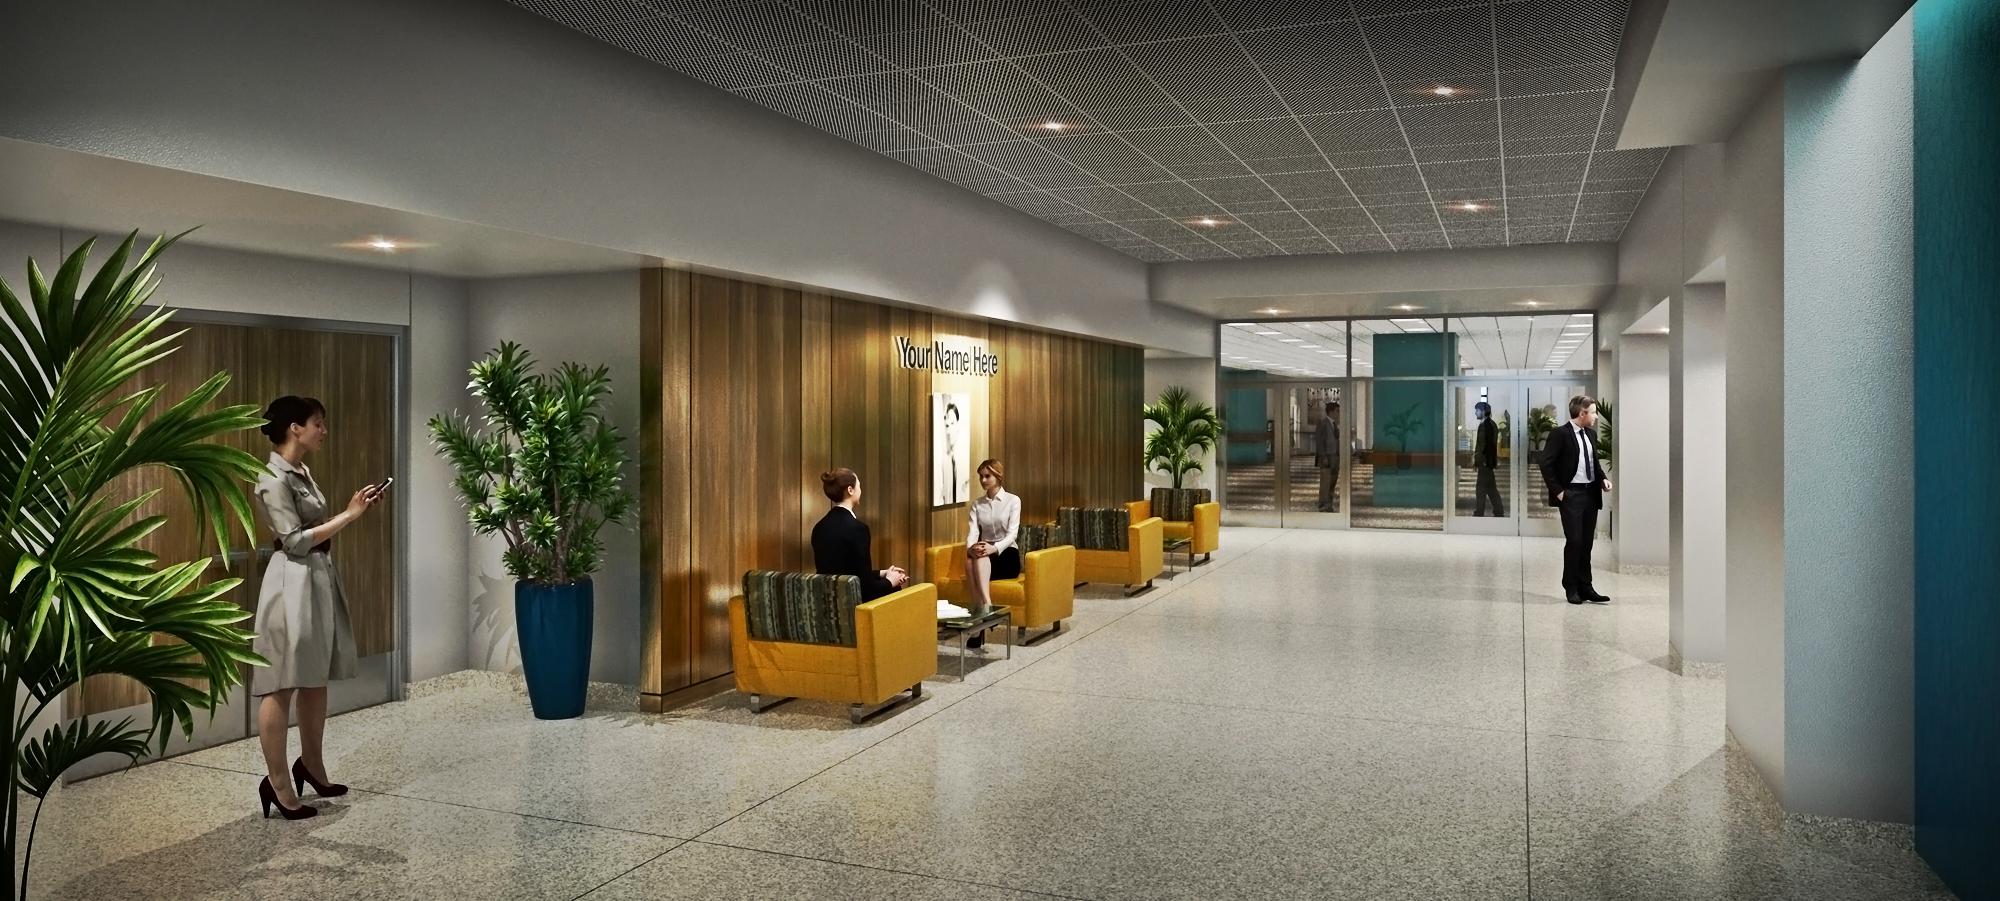 conference center interior design - design for campus conference center - new conference center east texas - butler architectural group